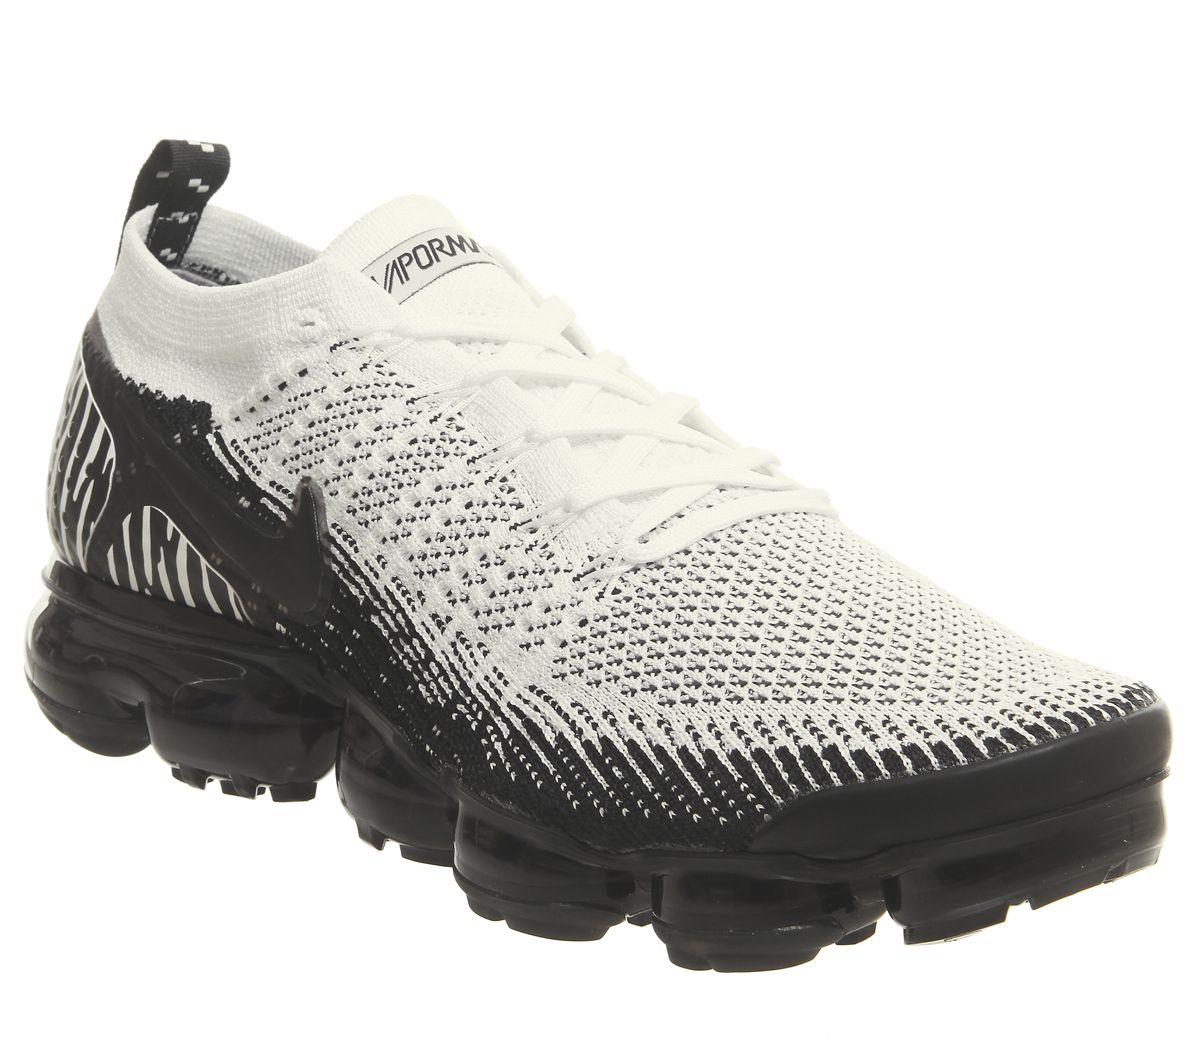 sports shoes b48ca 604de Air Vapormax Flyknit 2